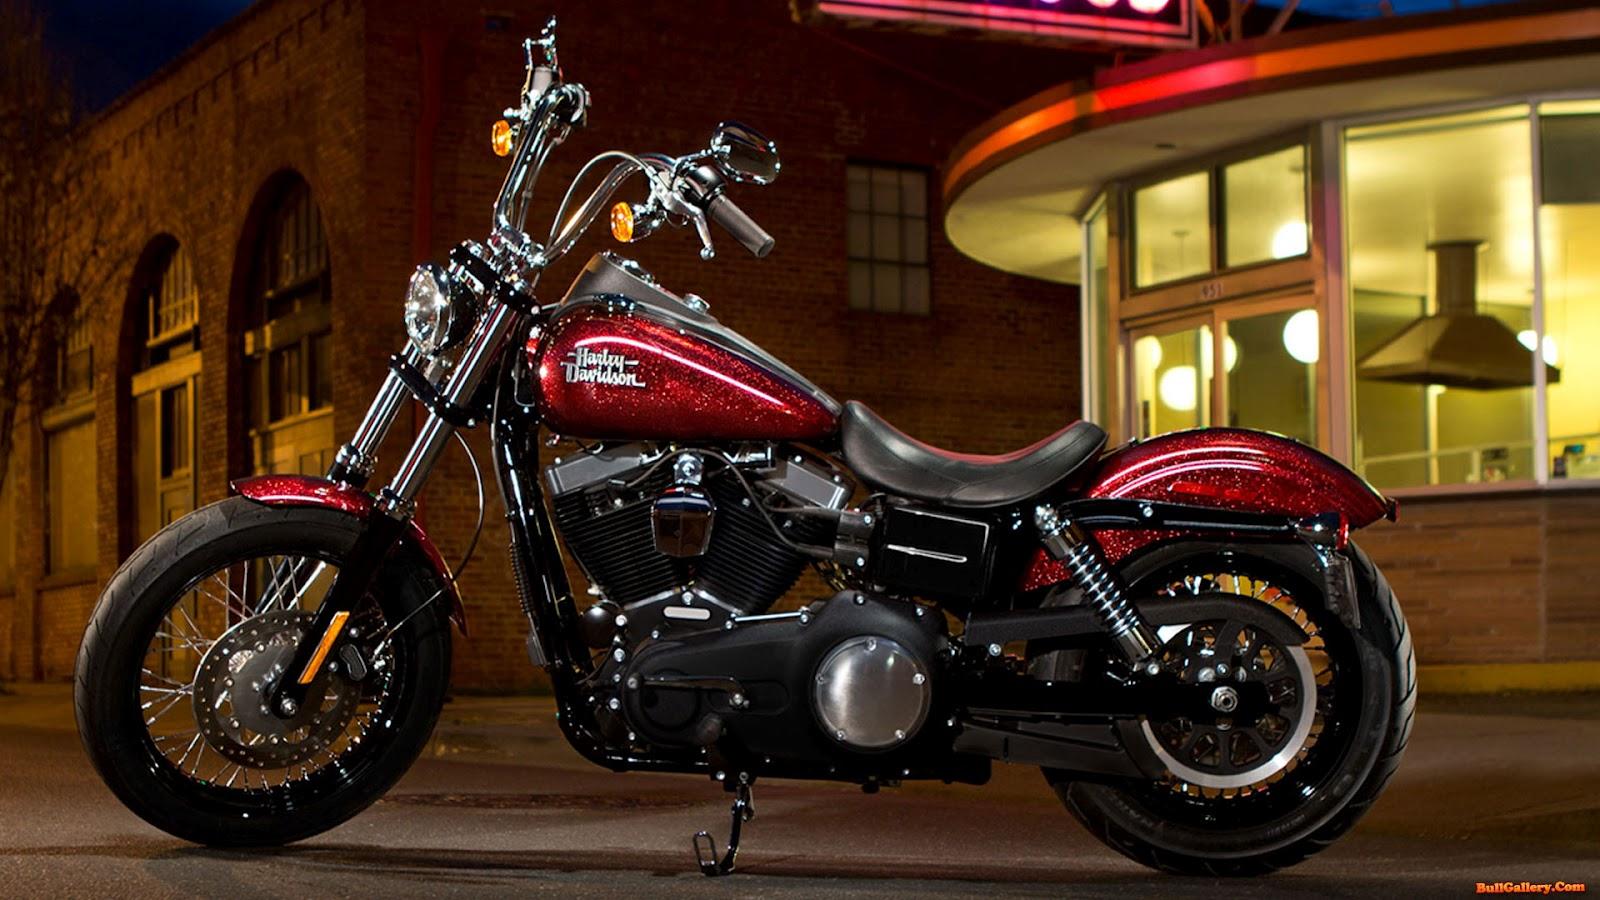 Harley Davidson Dyna Street Bob Wallpapers